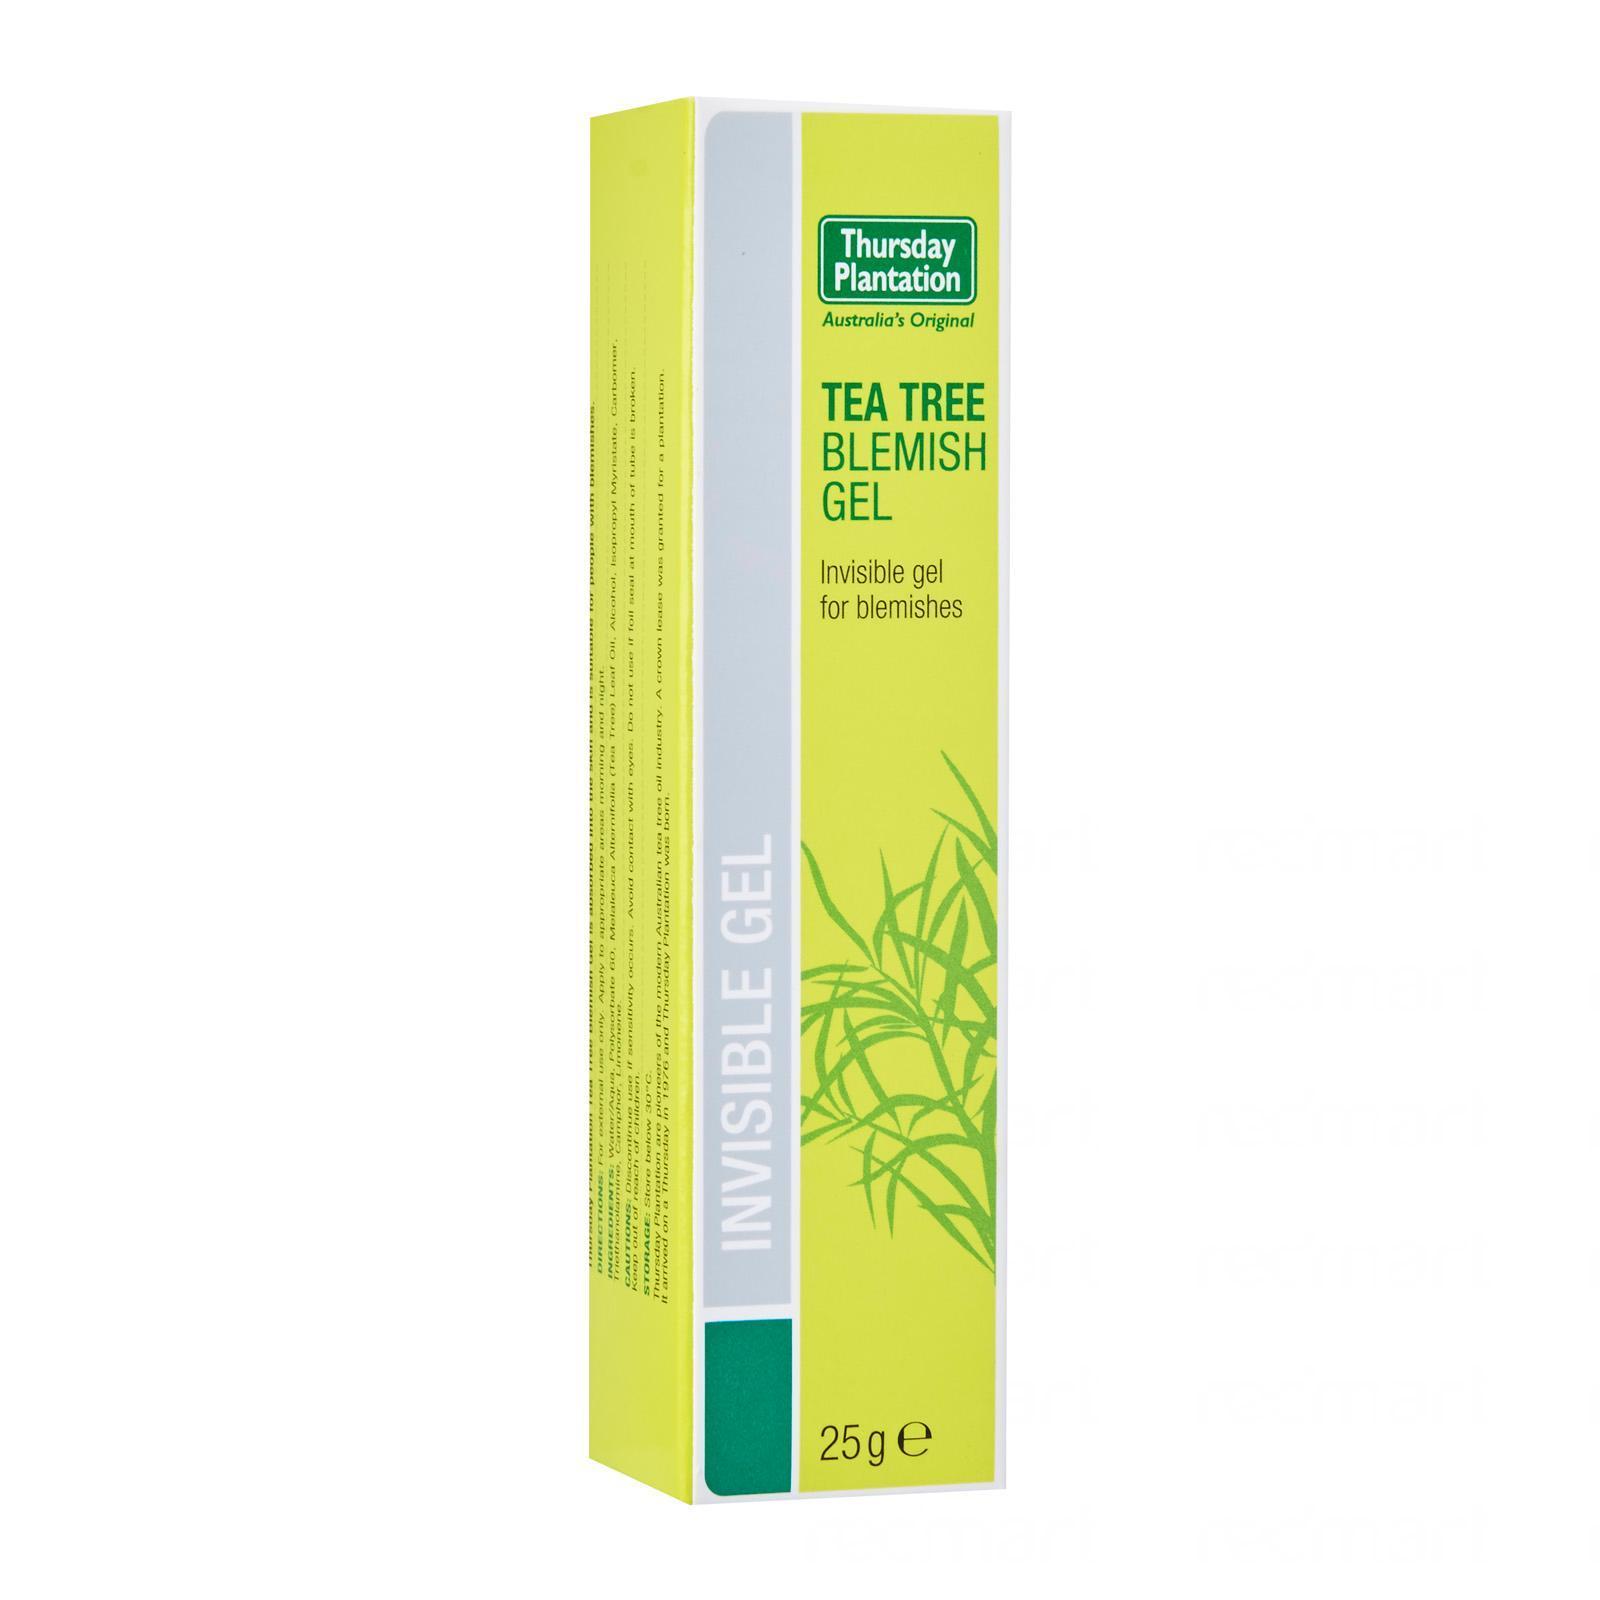 Thursday Plantation Tea Tree Blemish Gel - By Medic Drugstore